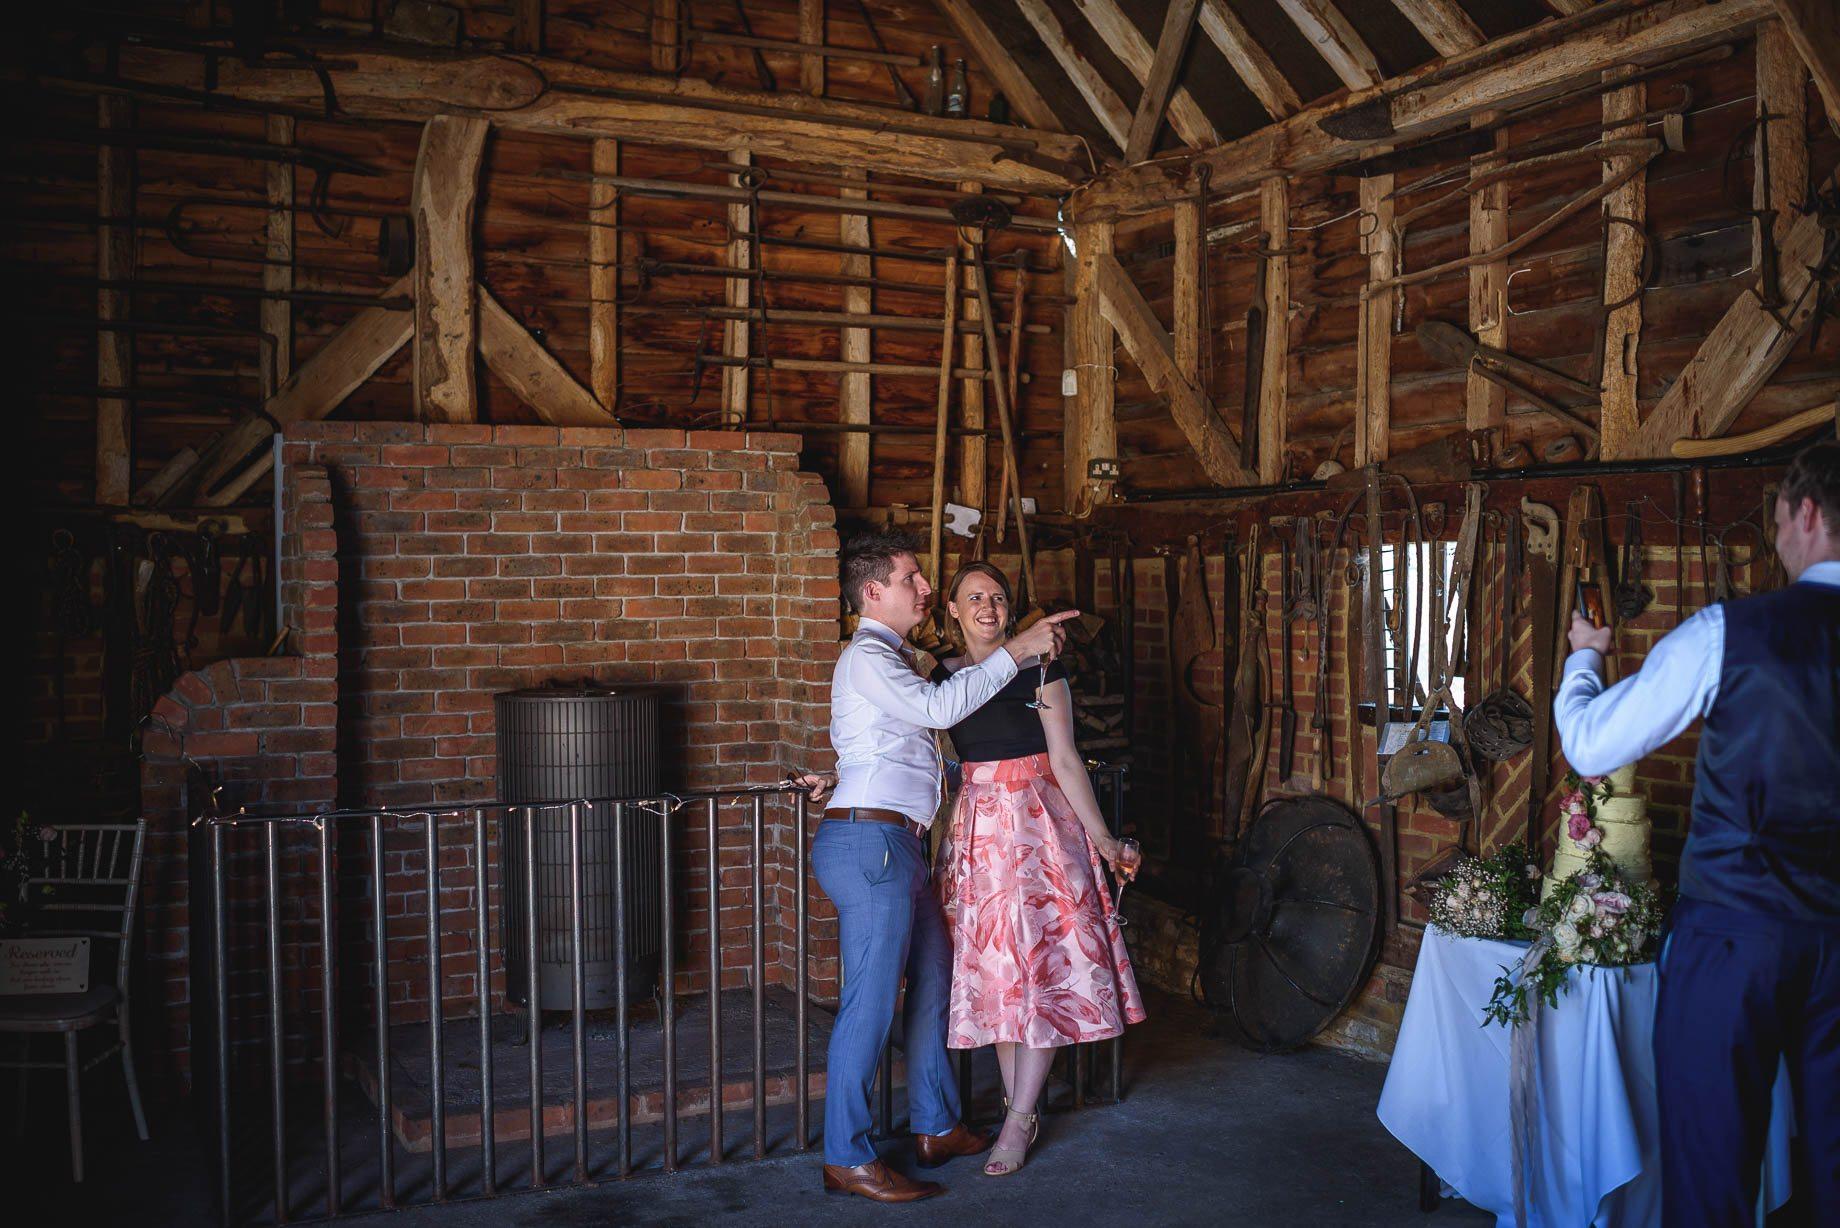 Gildings Barn wedding photography - Sarah and Steve (118 of 190)